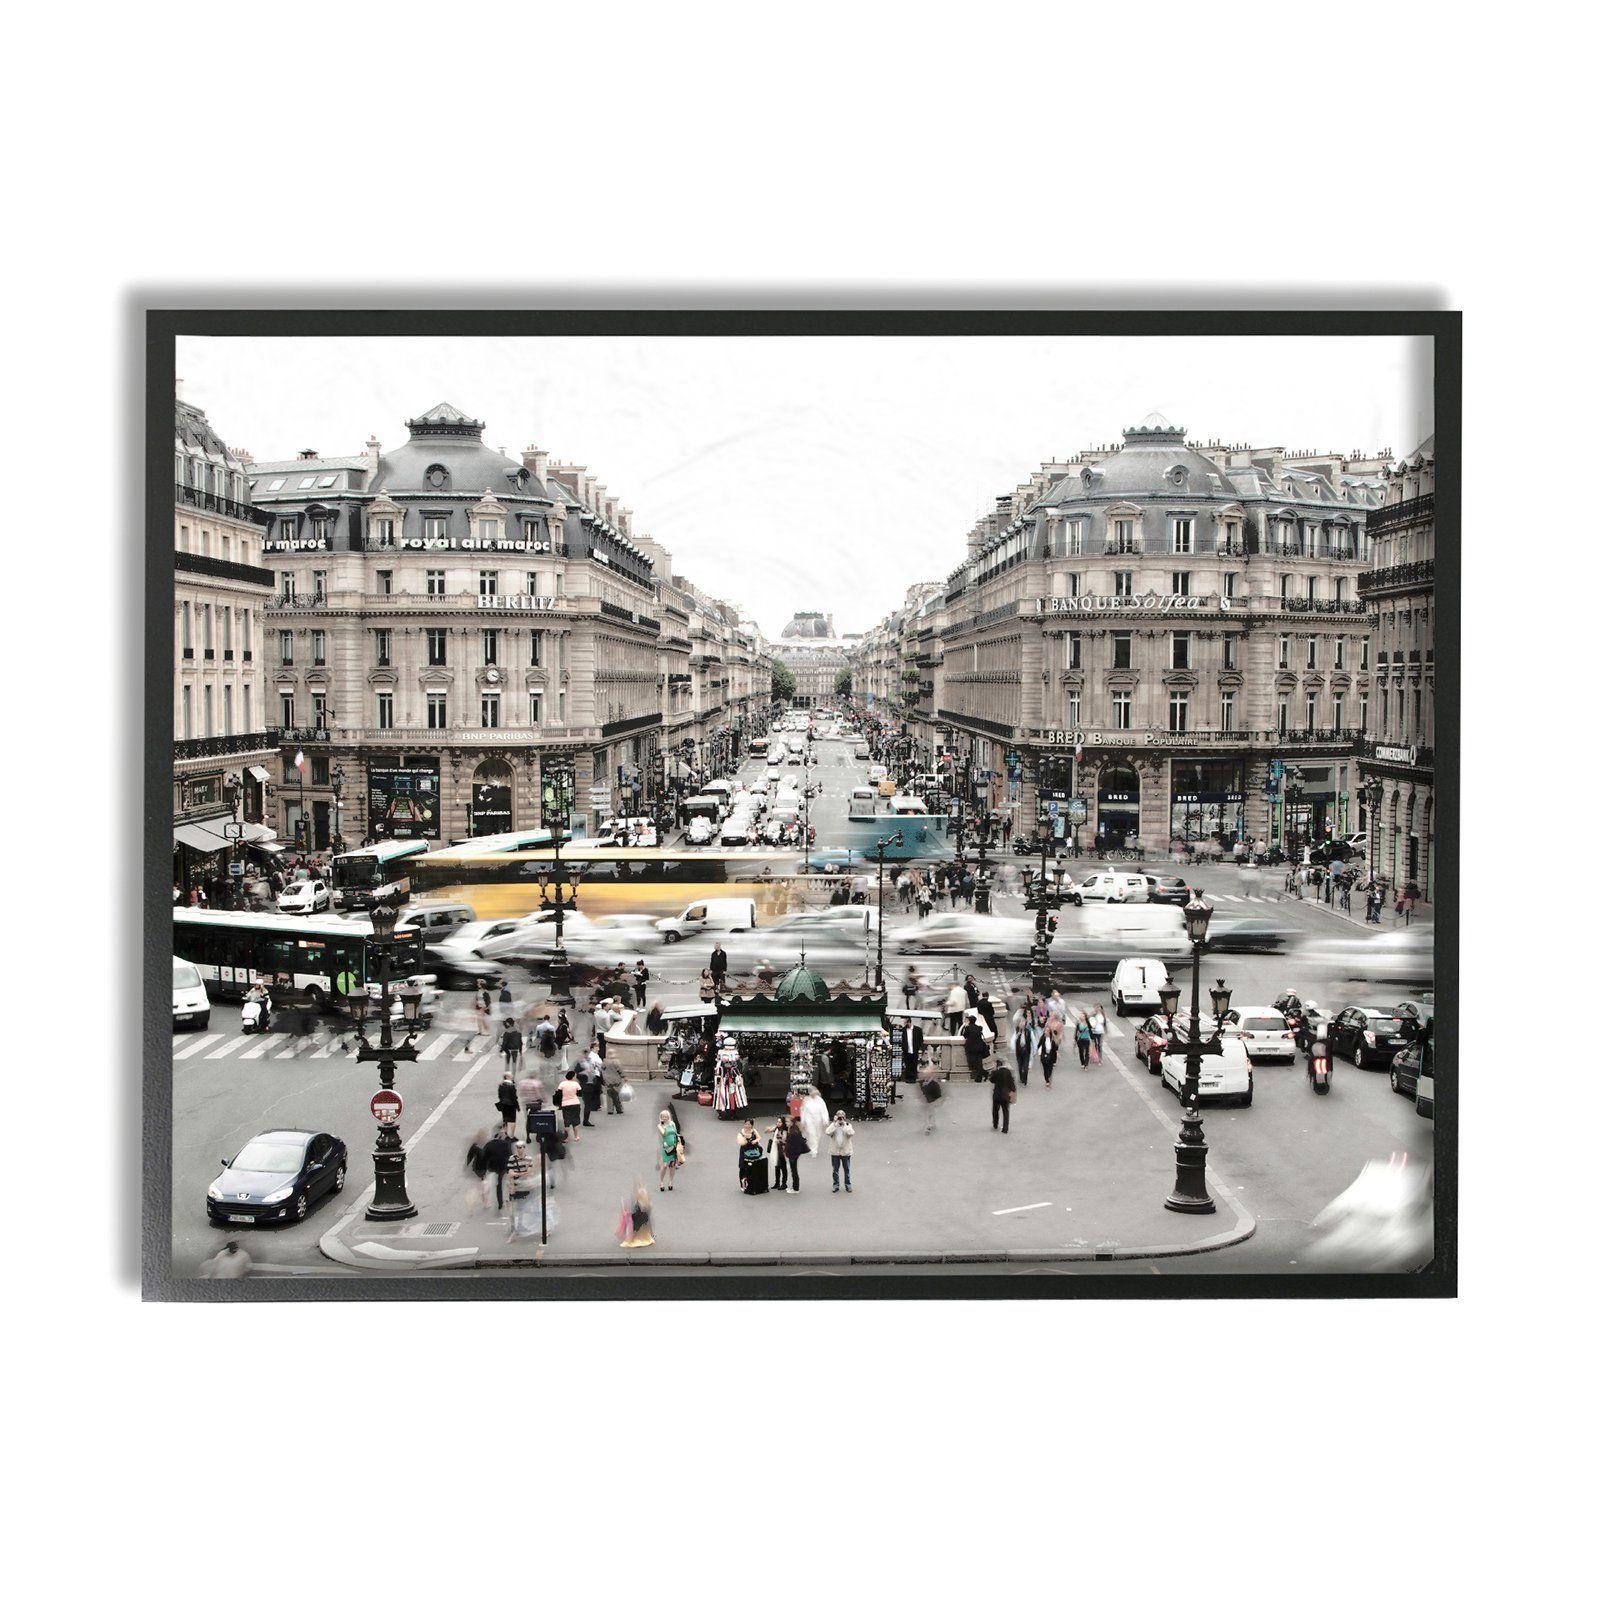 Stupell decor vintage paris textured photograph framed wall art